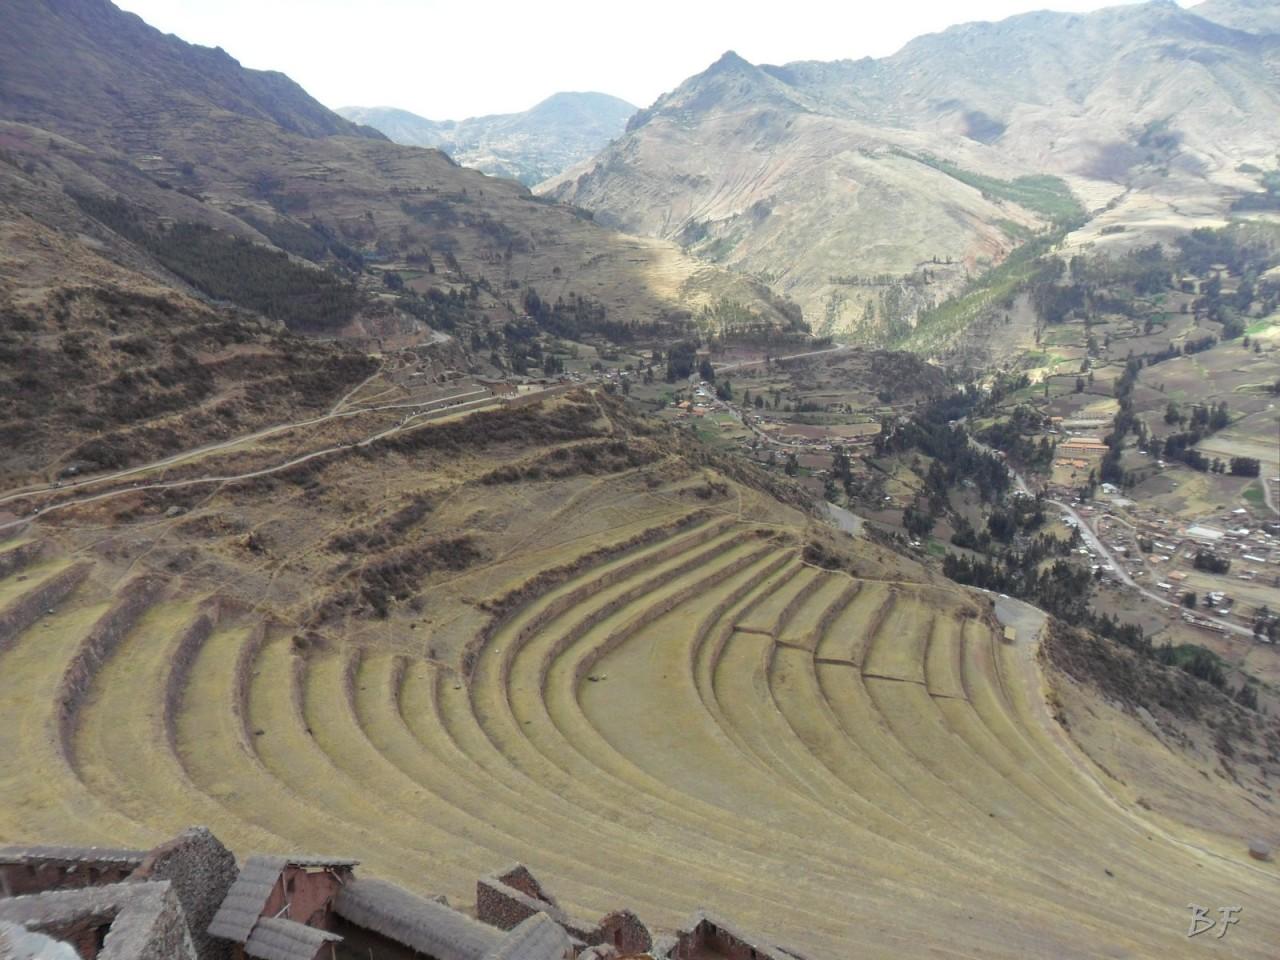 Mura-Poligonali-Megaliti-Altari-Rupestri-Pisac-Cusco-Perù-20